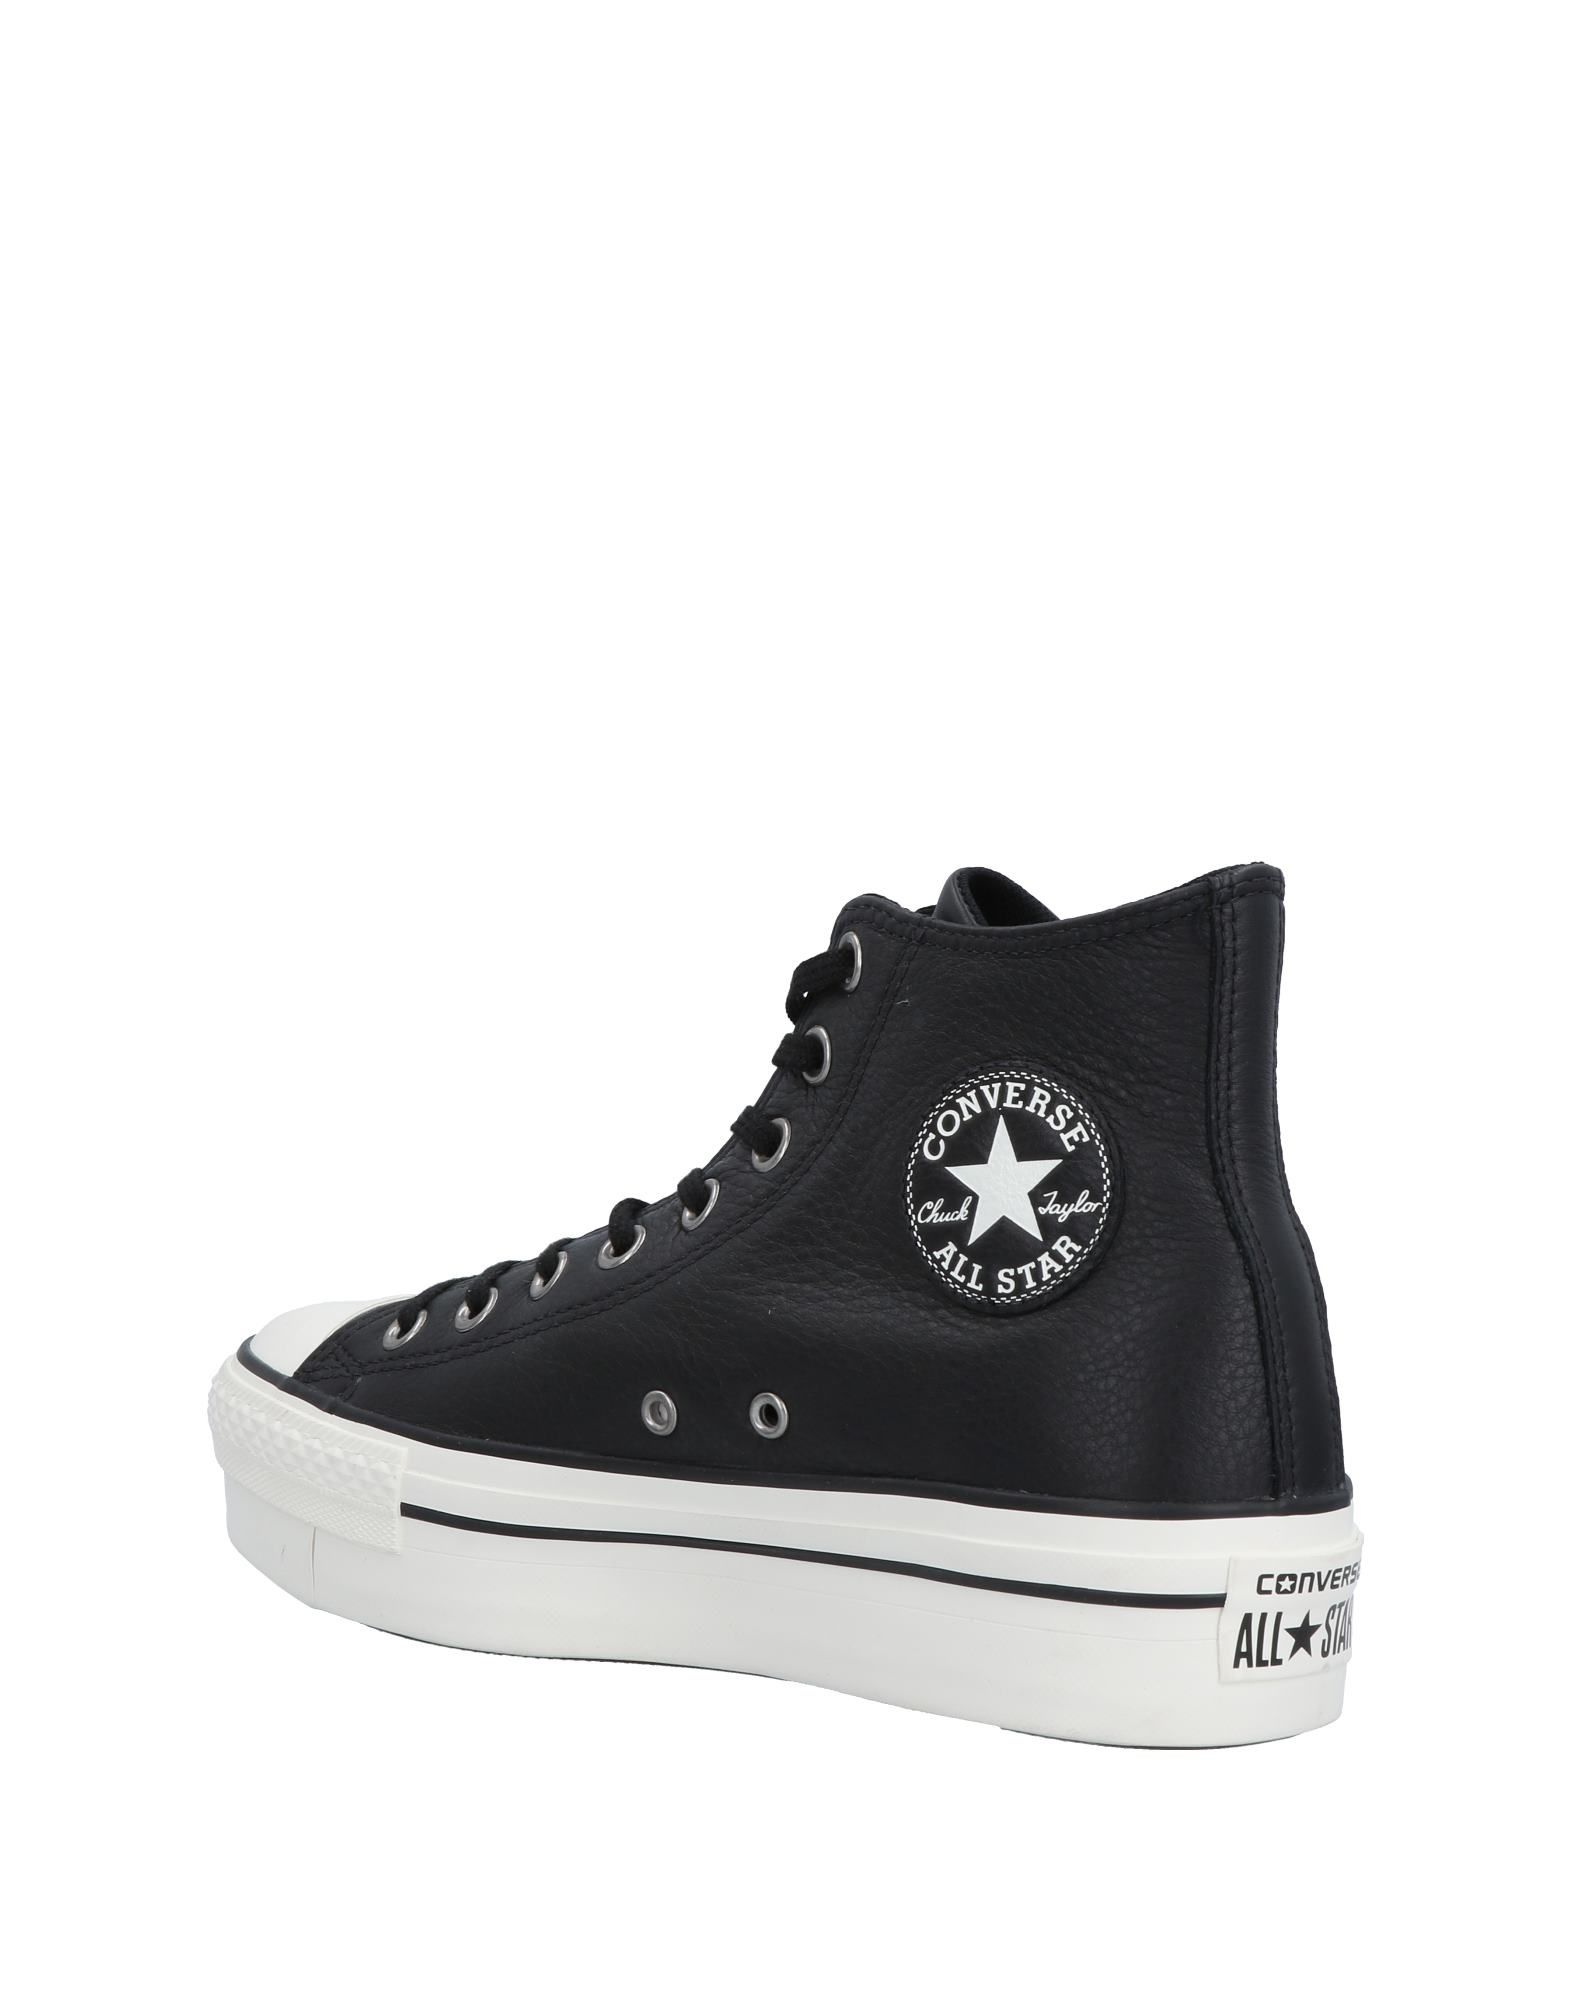 Converse All Star Sneakers Neue Damen  11489588DV Neue Sneakers Schuhe cc0074